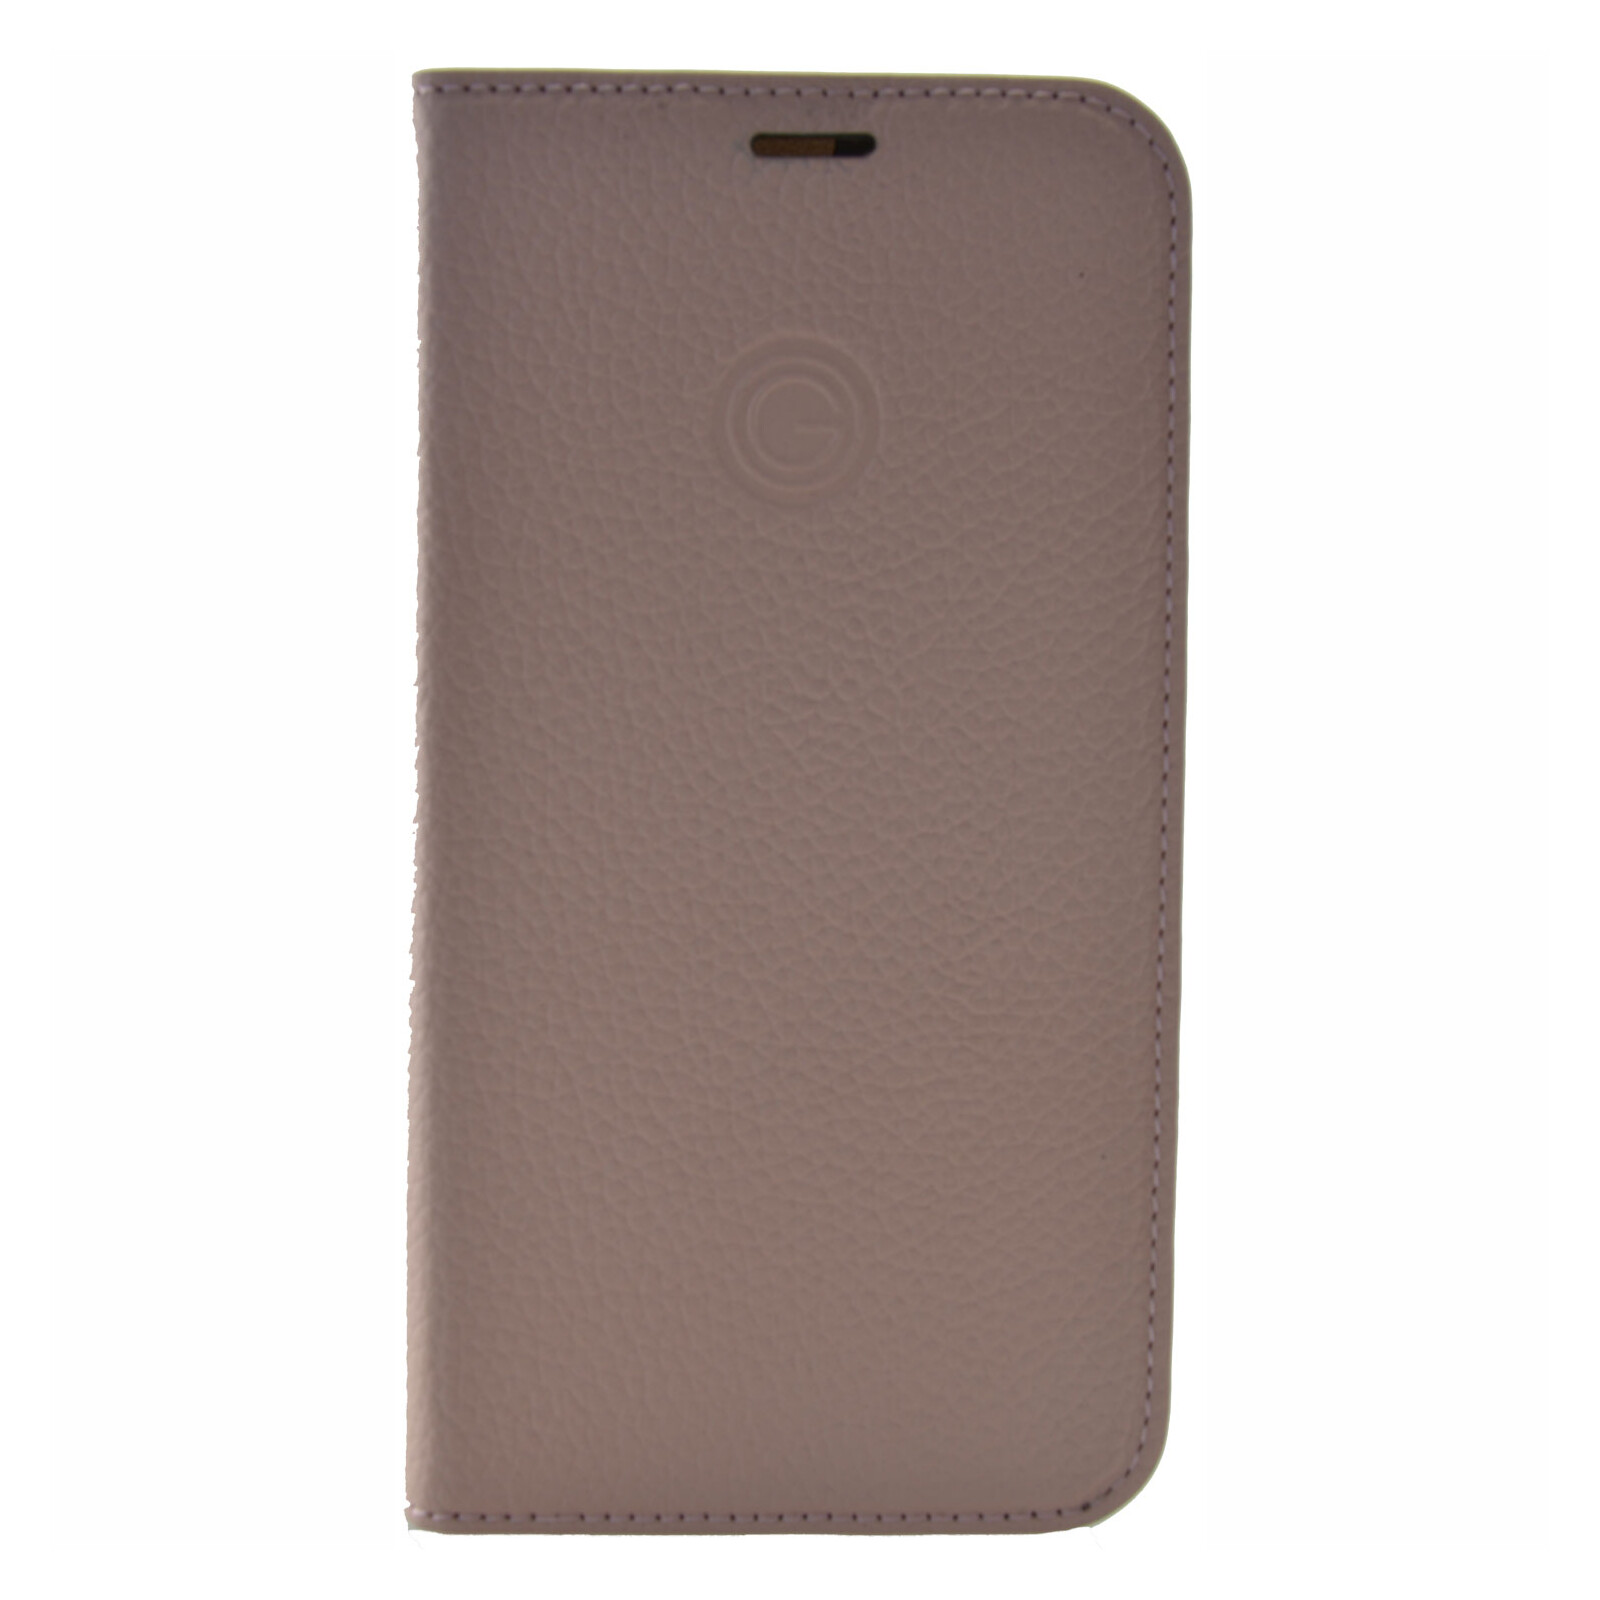 Galeli Booktasche MARC Apple iPhone 12 Max/Pro rose tan